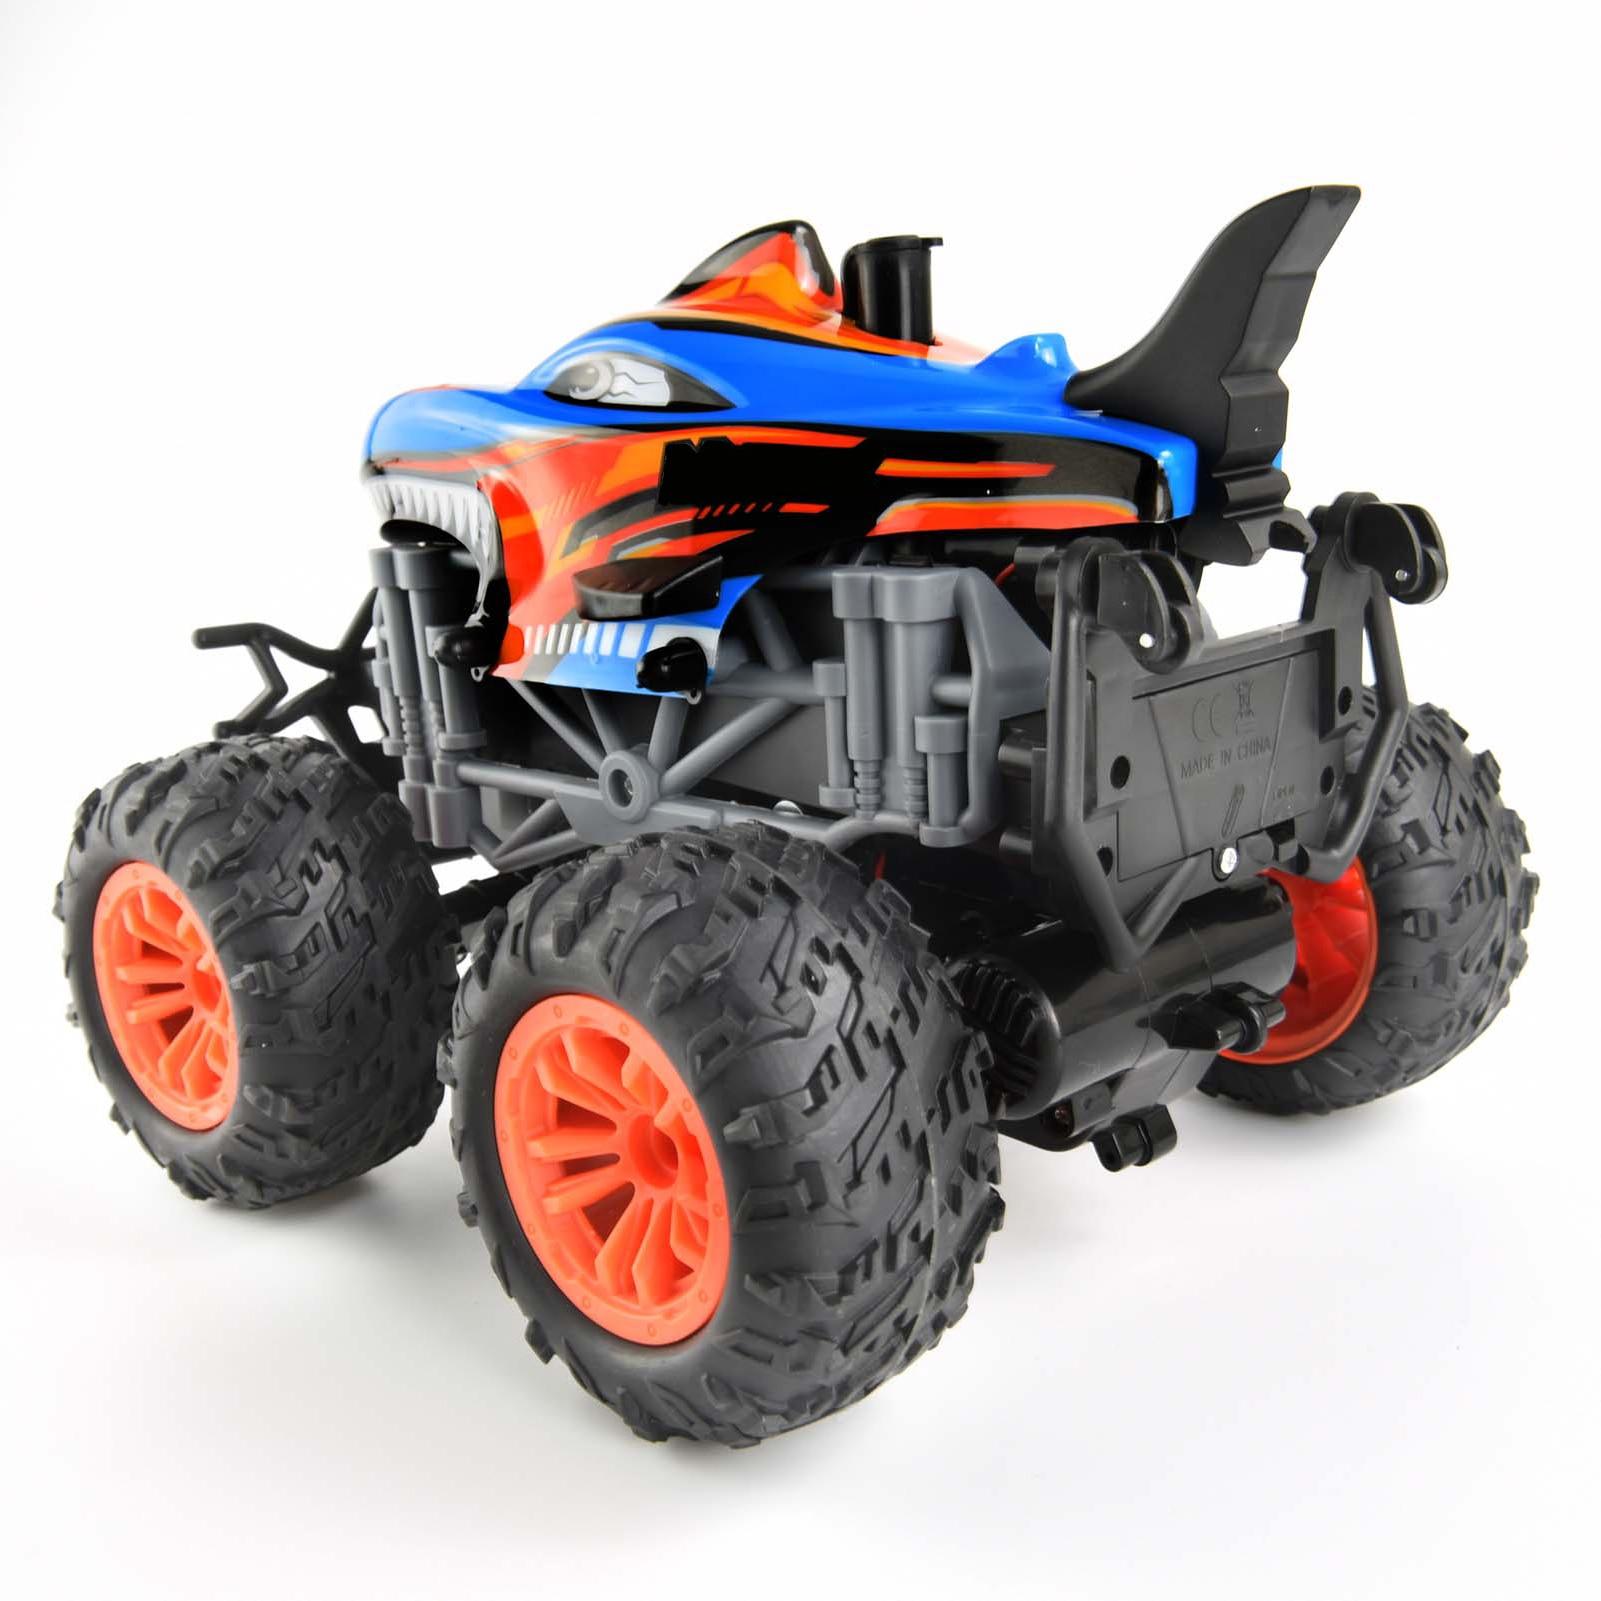 Toys 1/18 RC Car 2.4Ghz Stunt Car Remote Control Stunt Vehicle Toys with Rear Fog Stream Music LED Light Auto-Play RC Spray Car enlarge